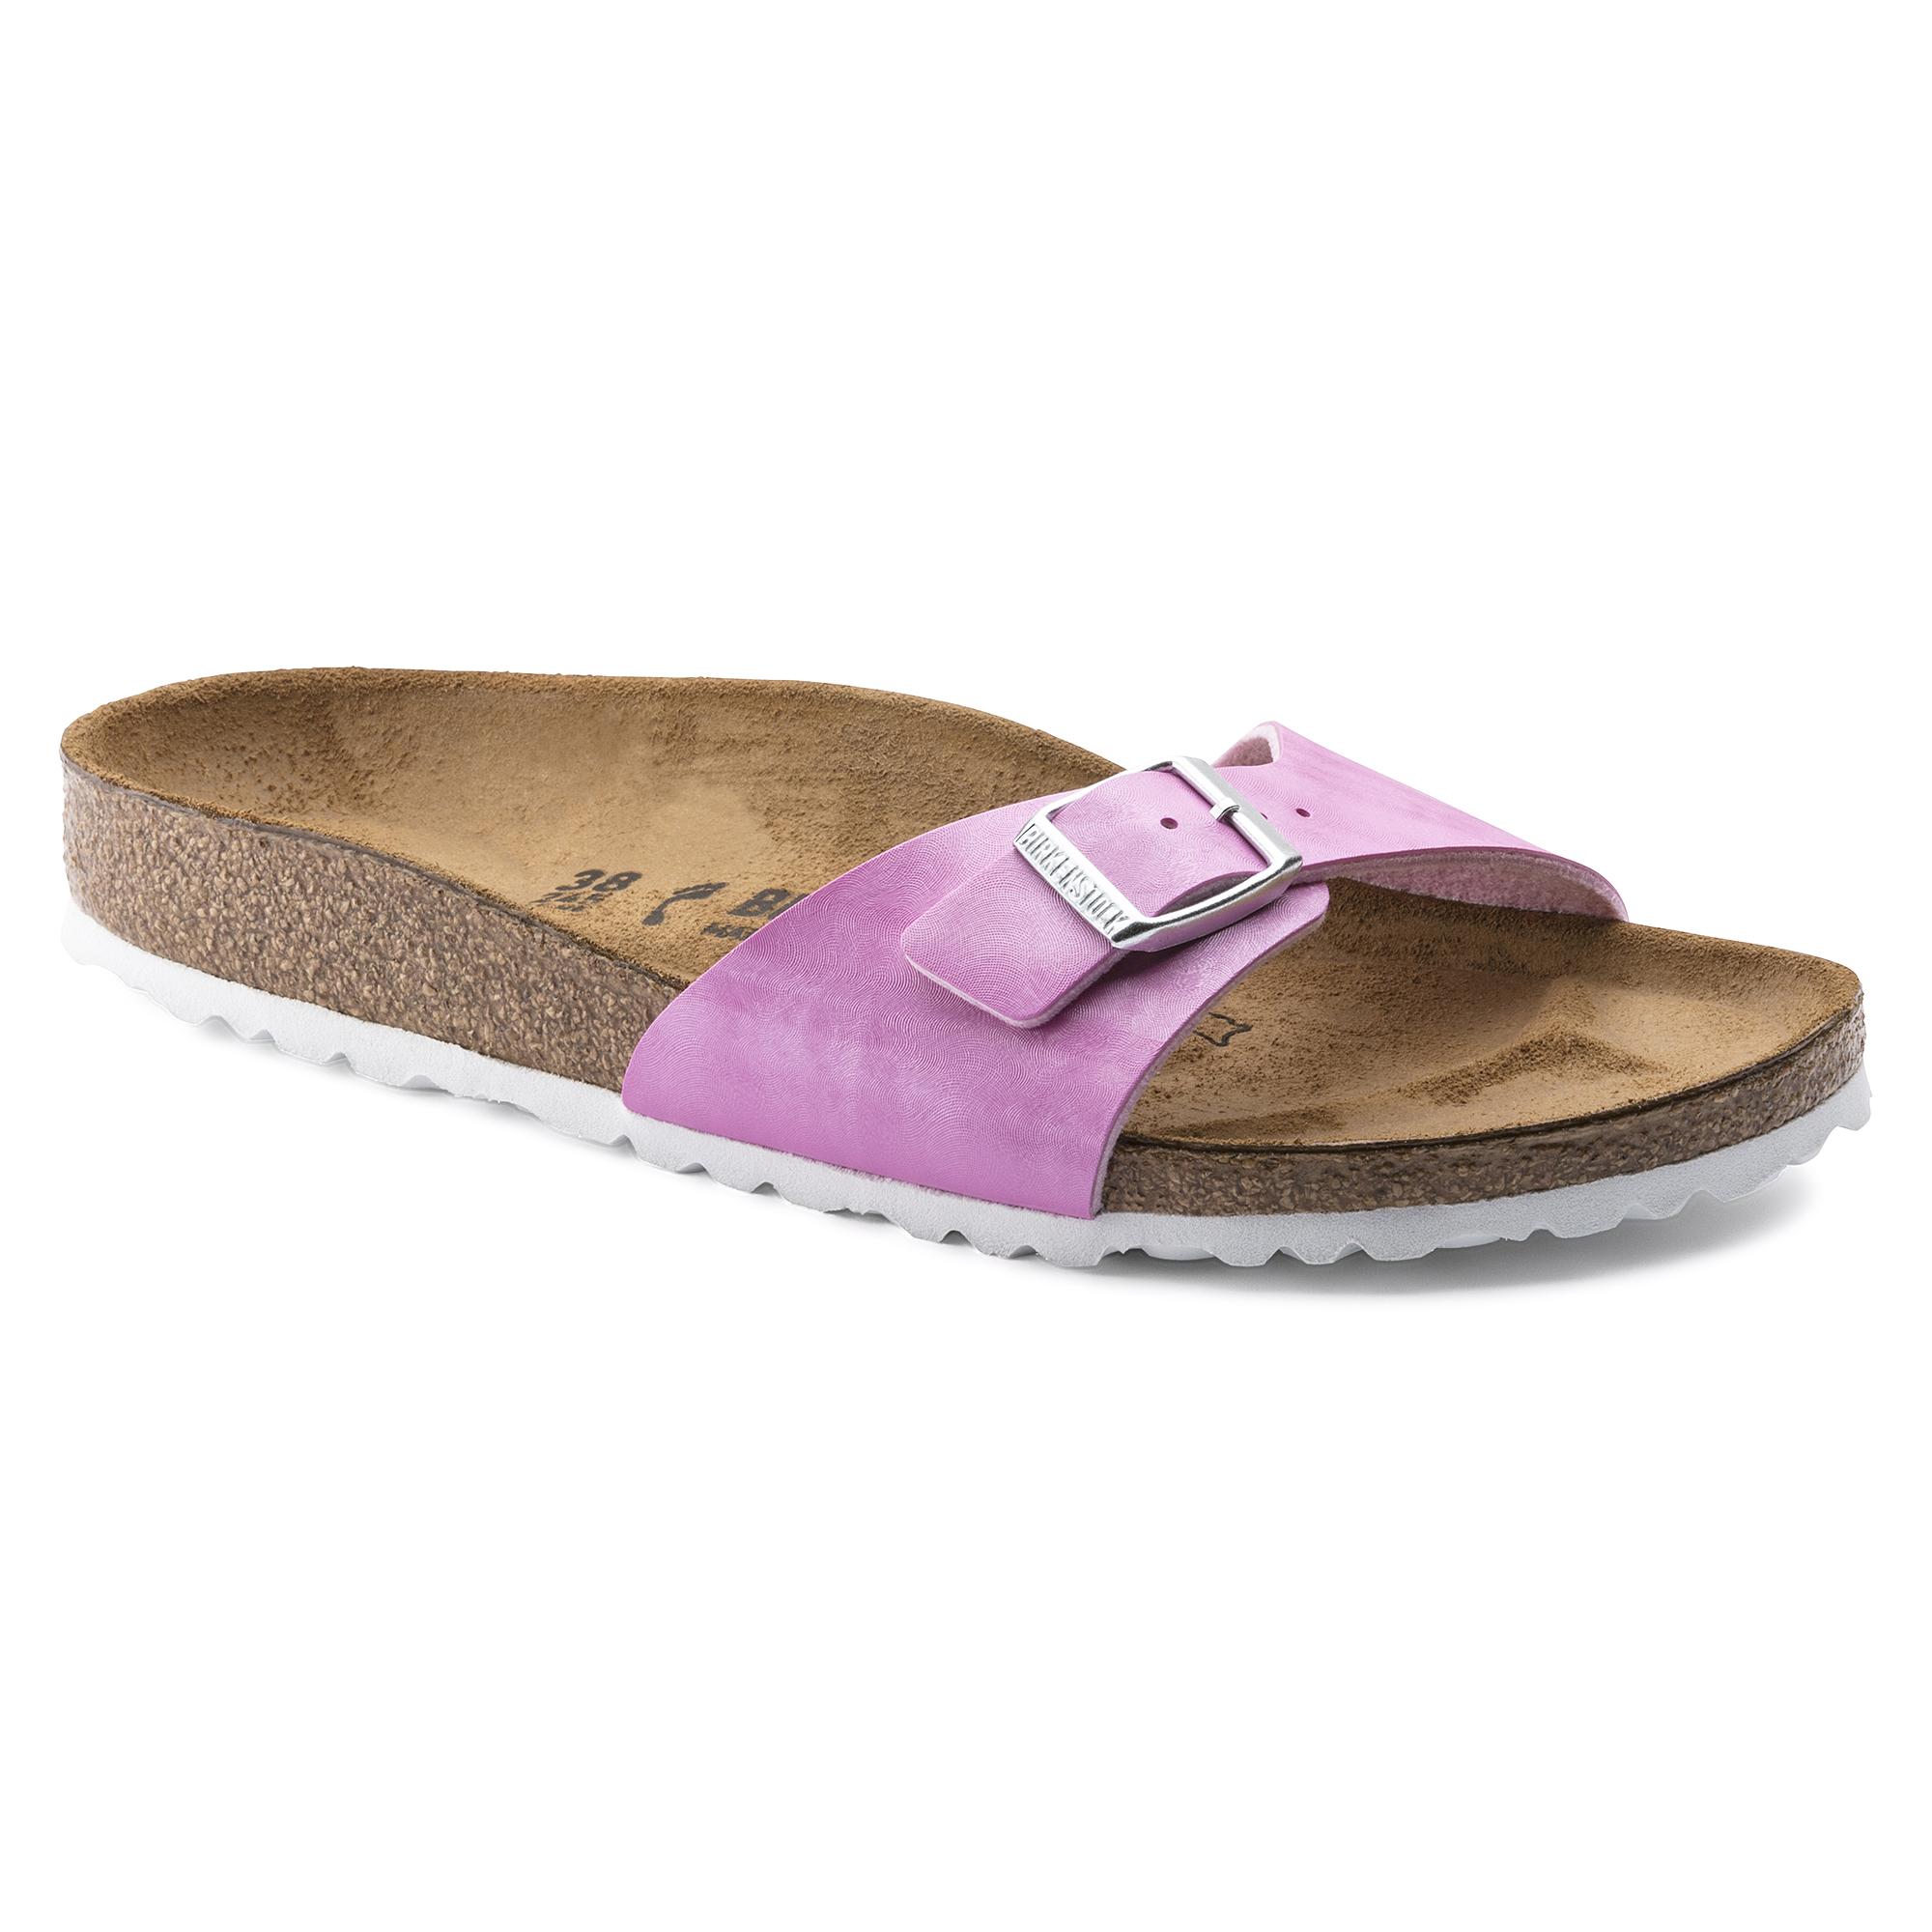 Birkenstock Zapatos Destalonados MadridBirko-Flor®Violeta vkE0giKhNw